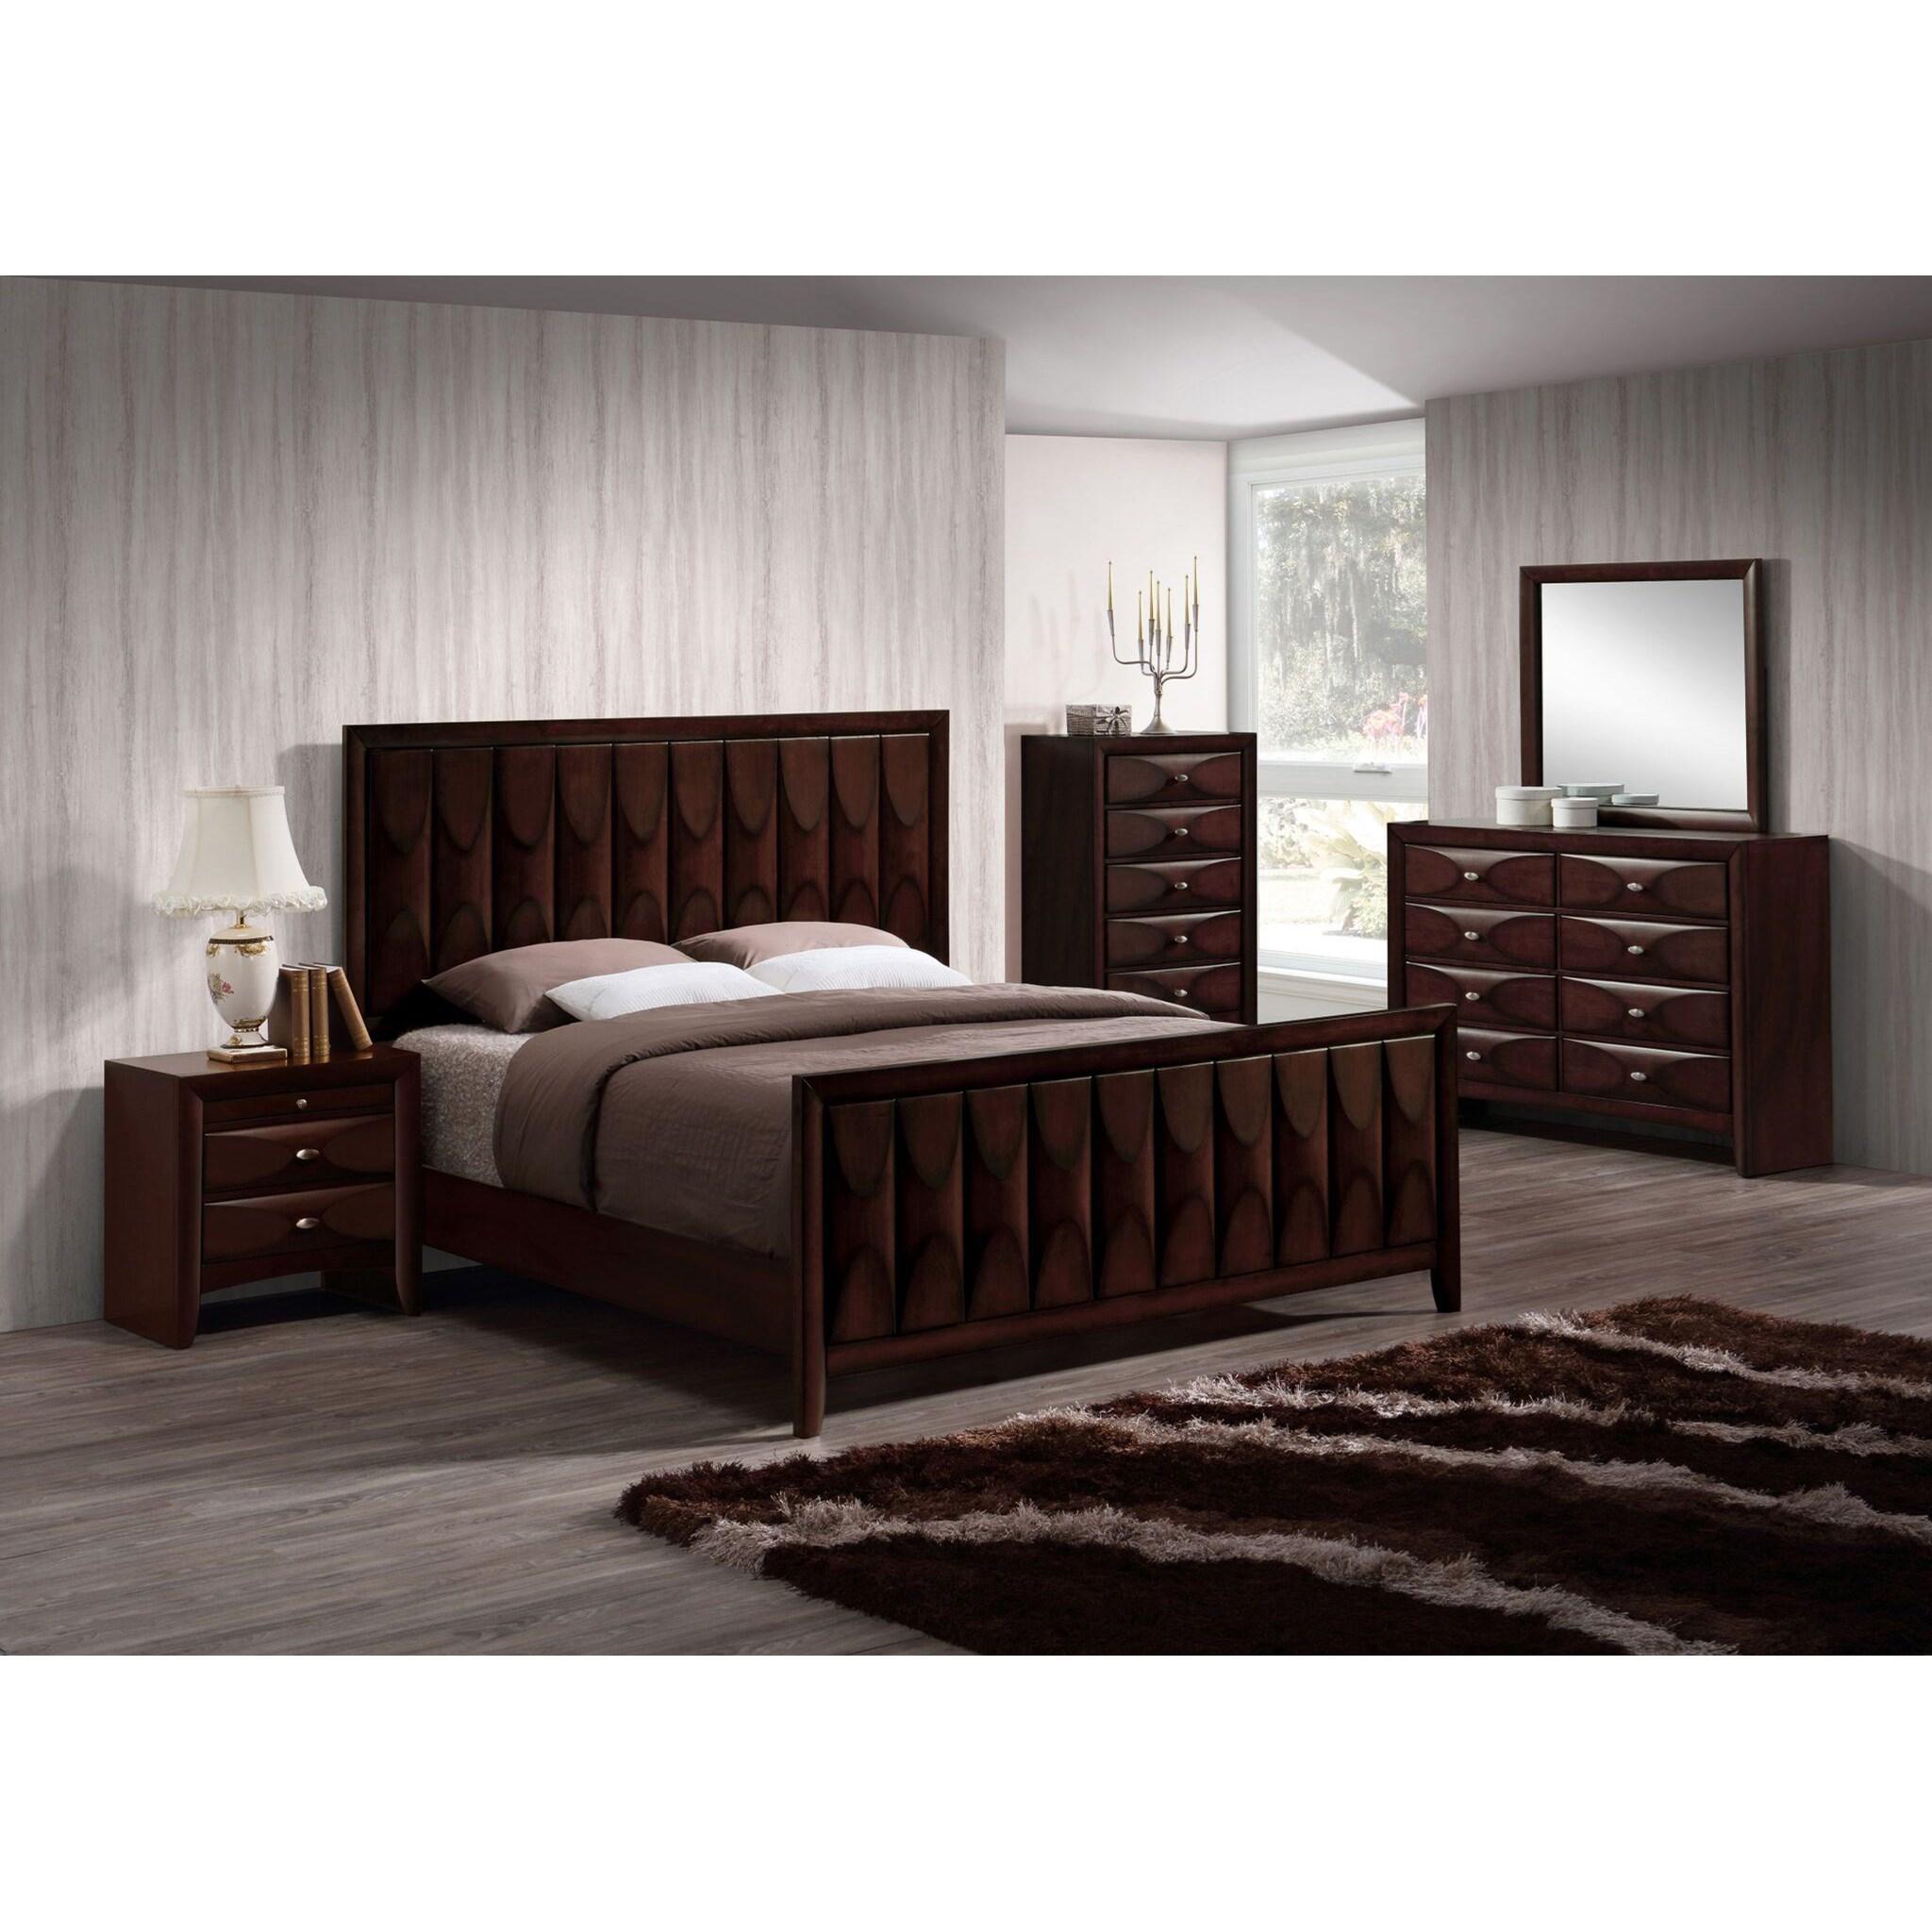 Lifestyle Banfield 5PC King Bedroom Set - Item Number: 6181B K Bedroom Group